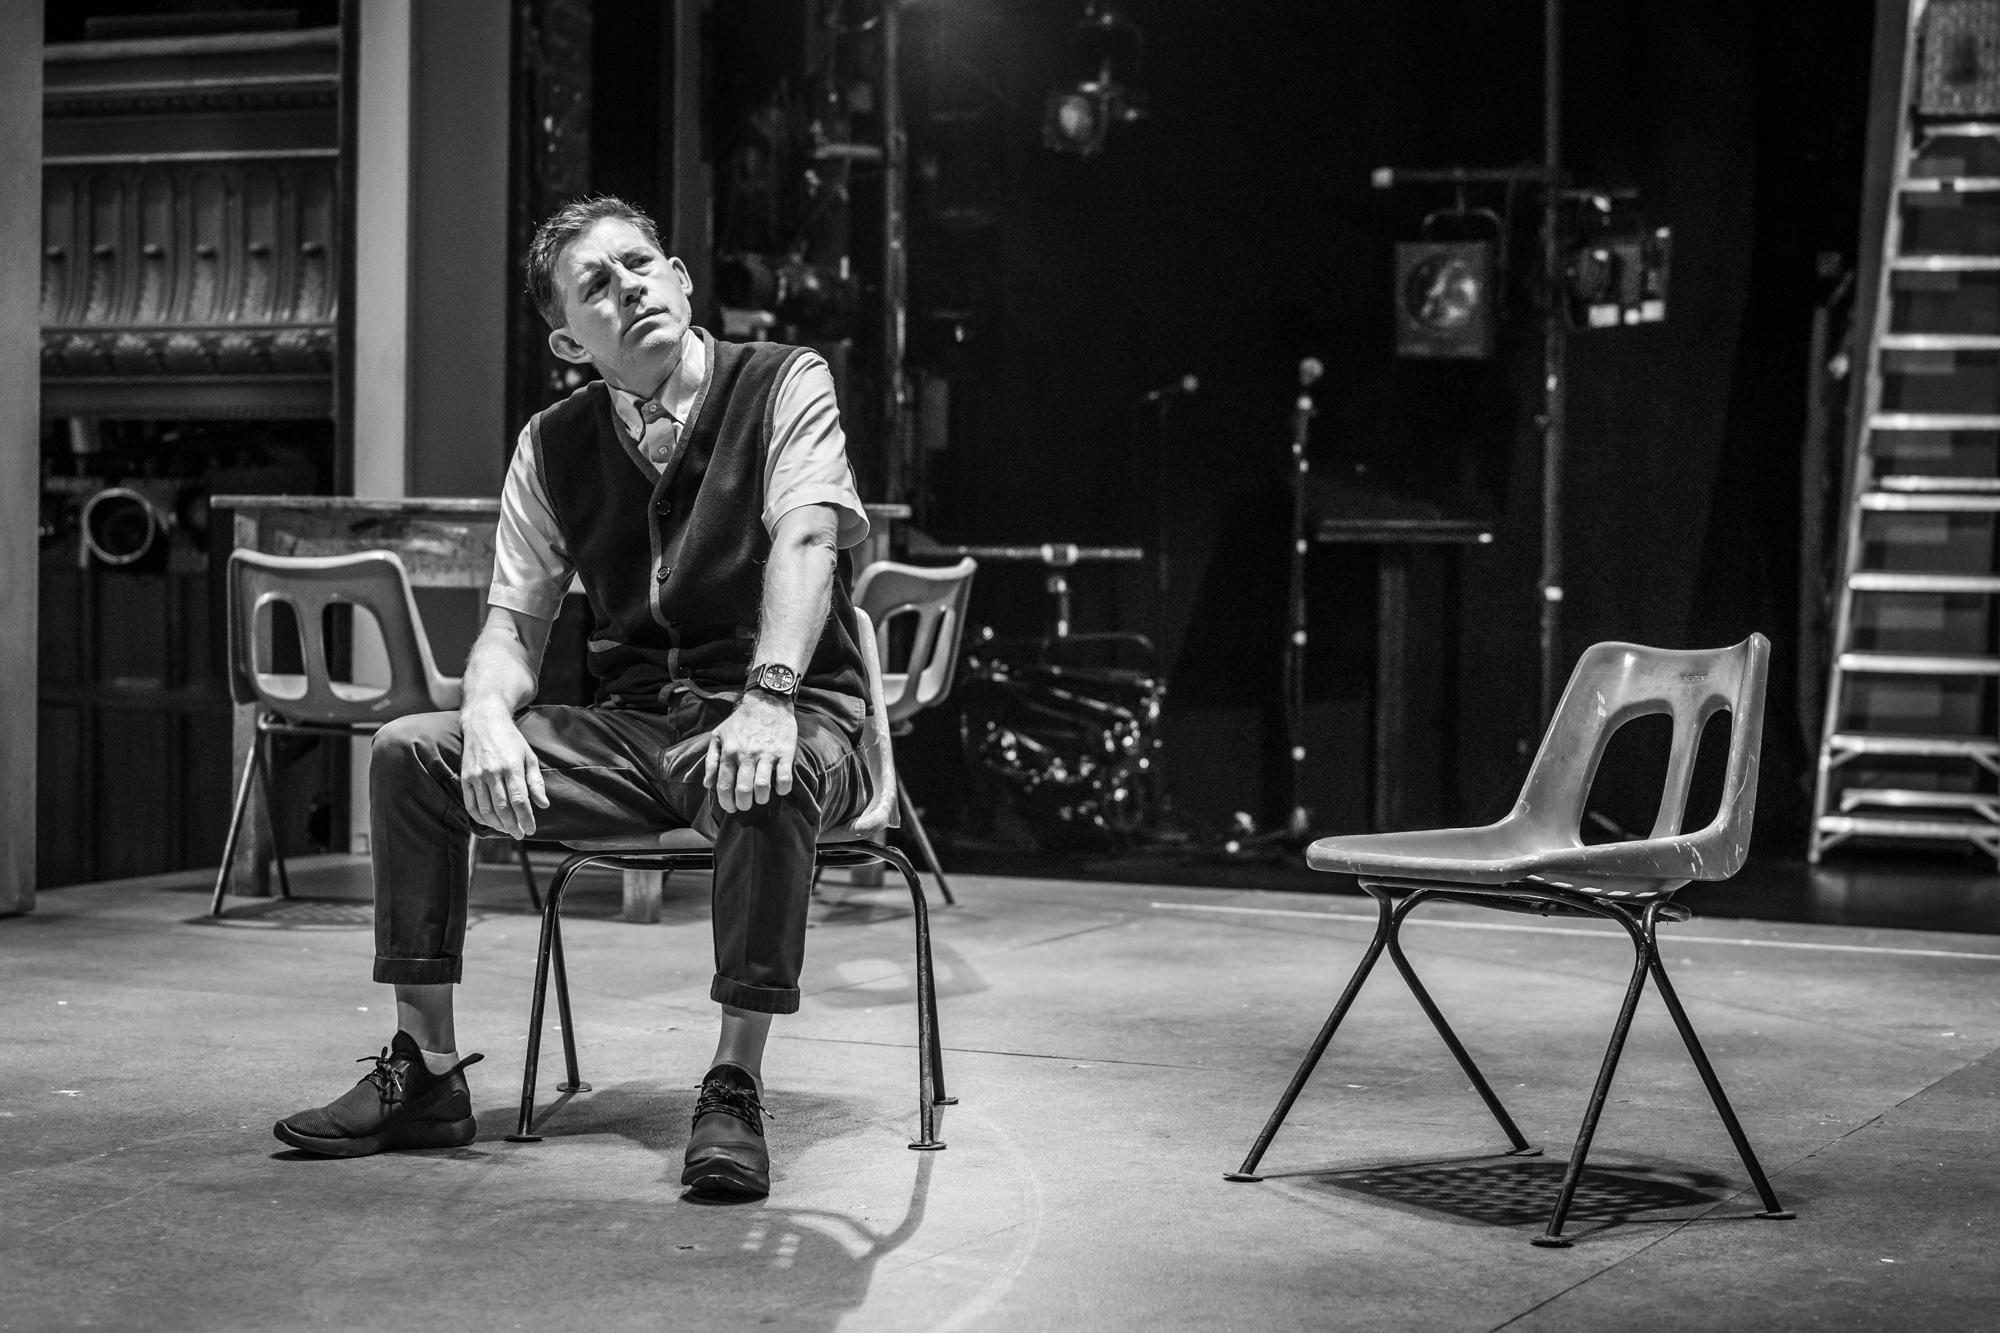 Monologue • Harold Pinter Theatre • Dir. Jamie Lloyd